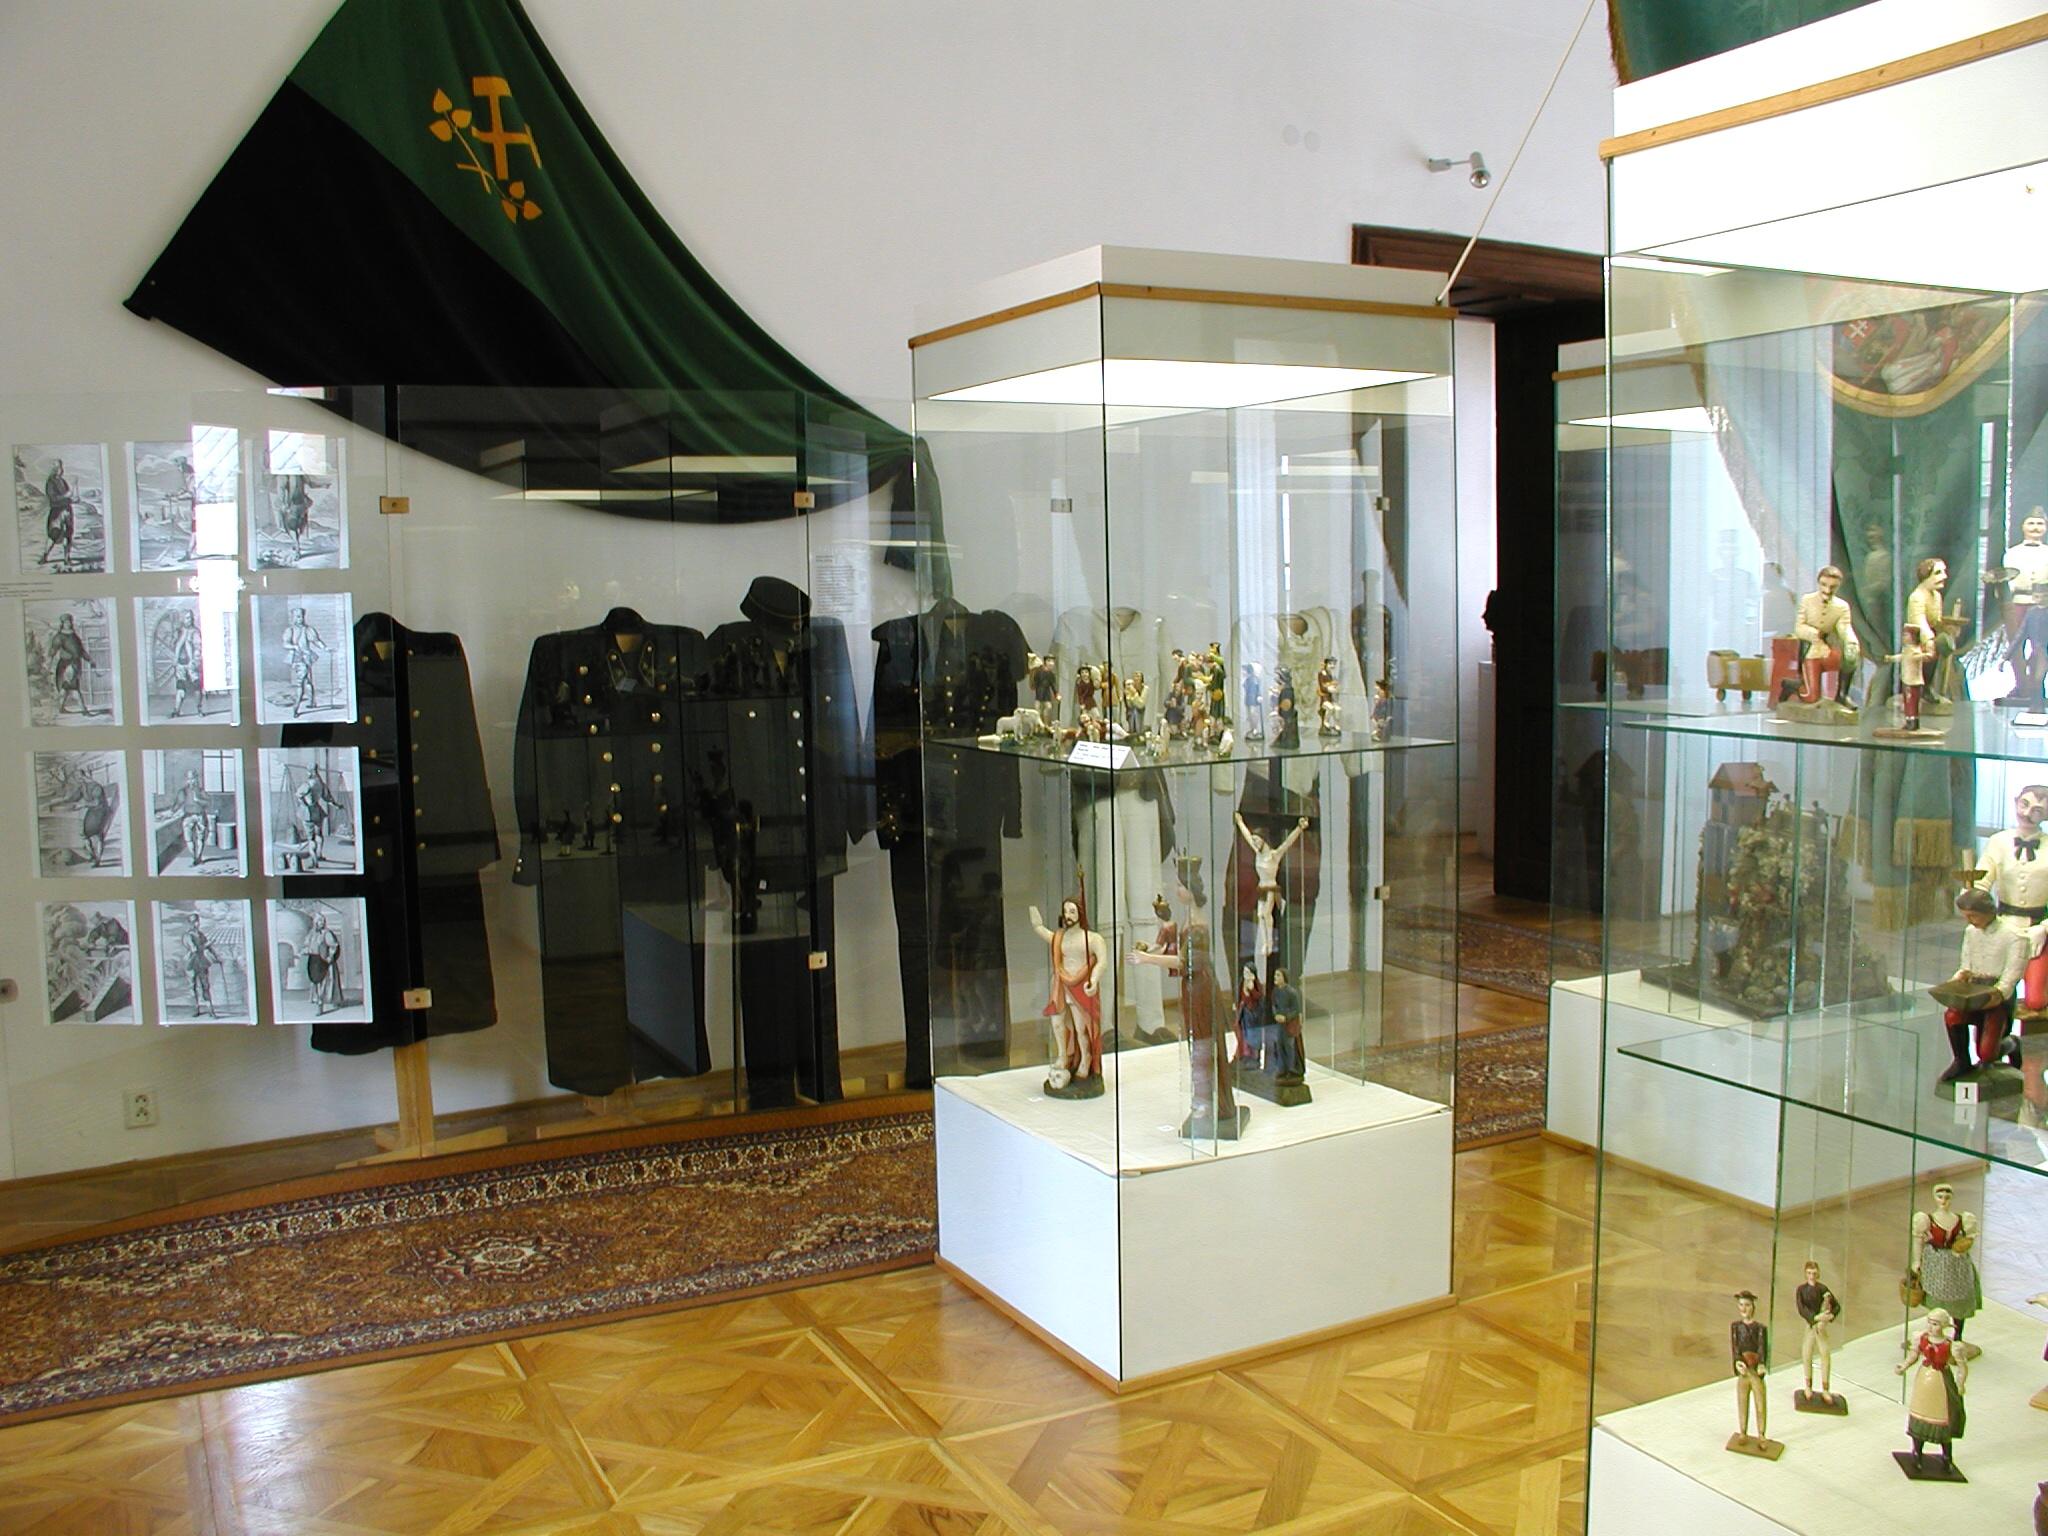 https://www.banskastiavnica.travel/wp-content/uploads/2014/05/KMHF-Foto%C2%A9Lu%C5%BEina-4.jpg